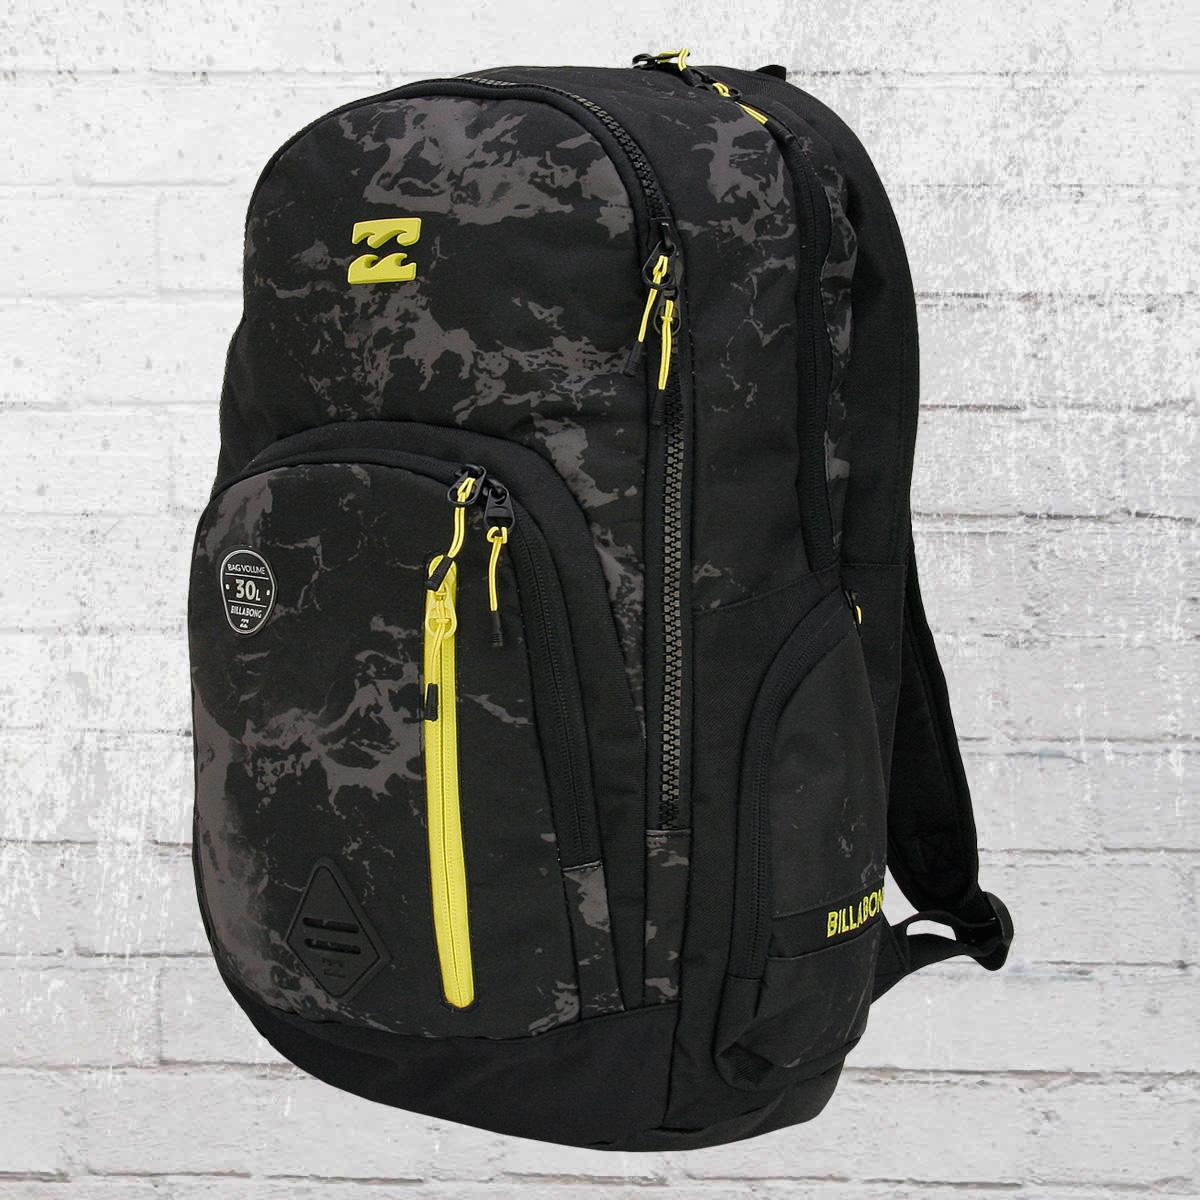 billabong command backpack rucksack mit laptopfach schwarz jetzt im online shop bestellen. Black Bedroom Furniture Sets. Home Design Ideas